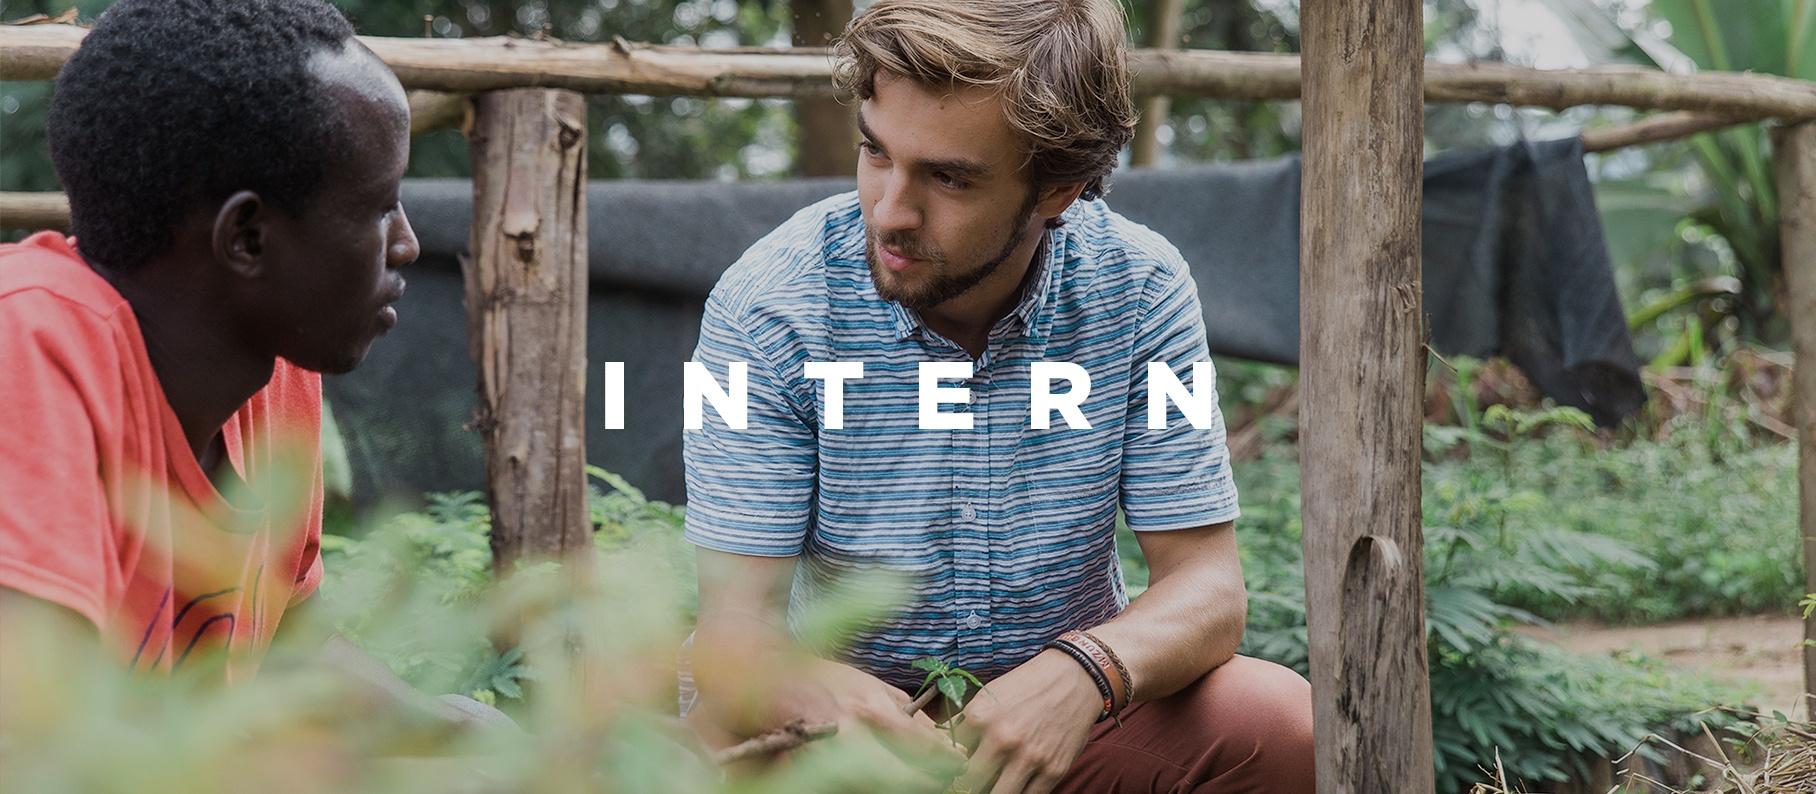 intern.jpg